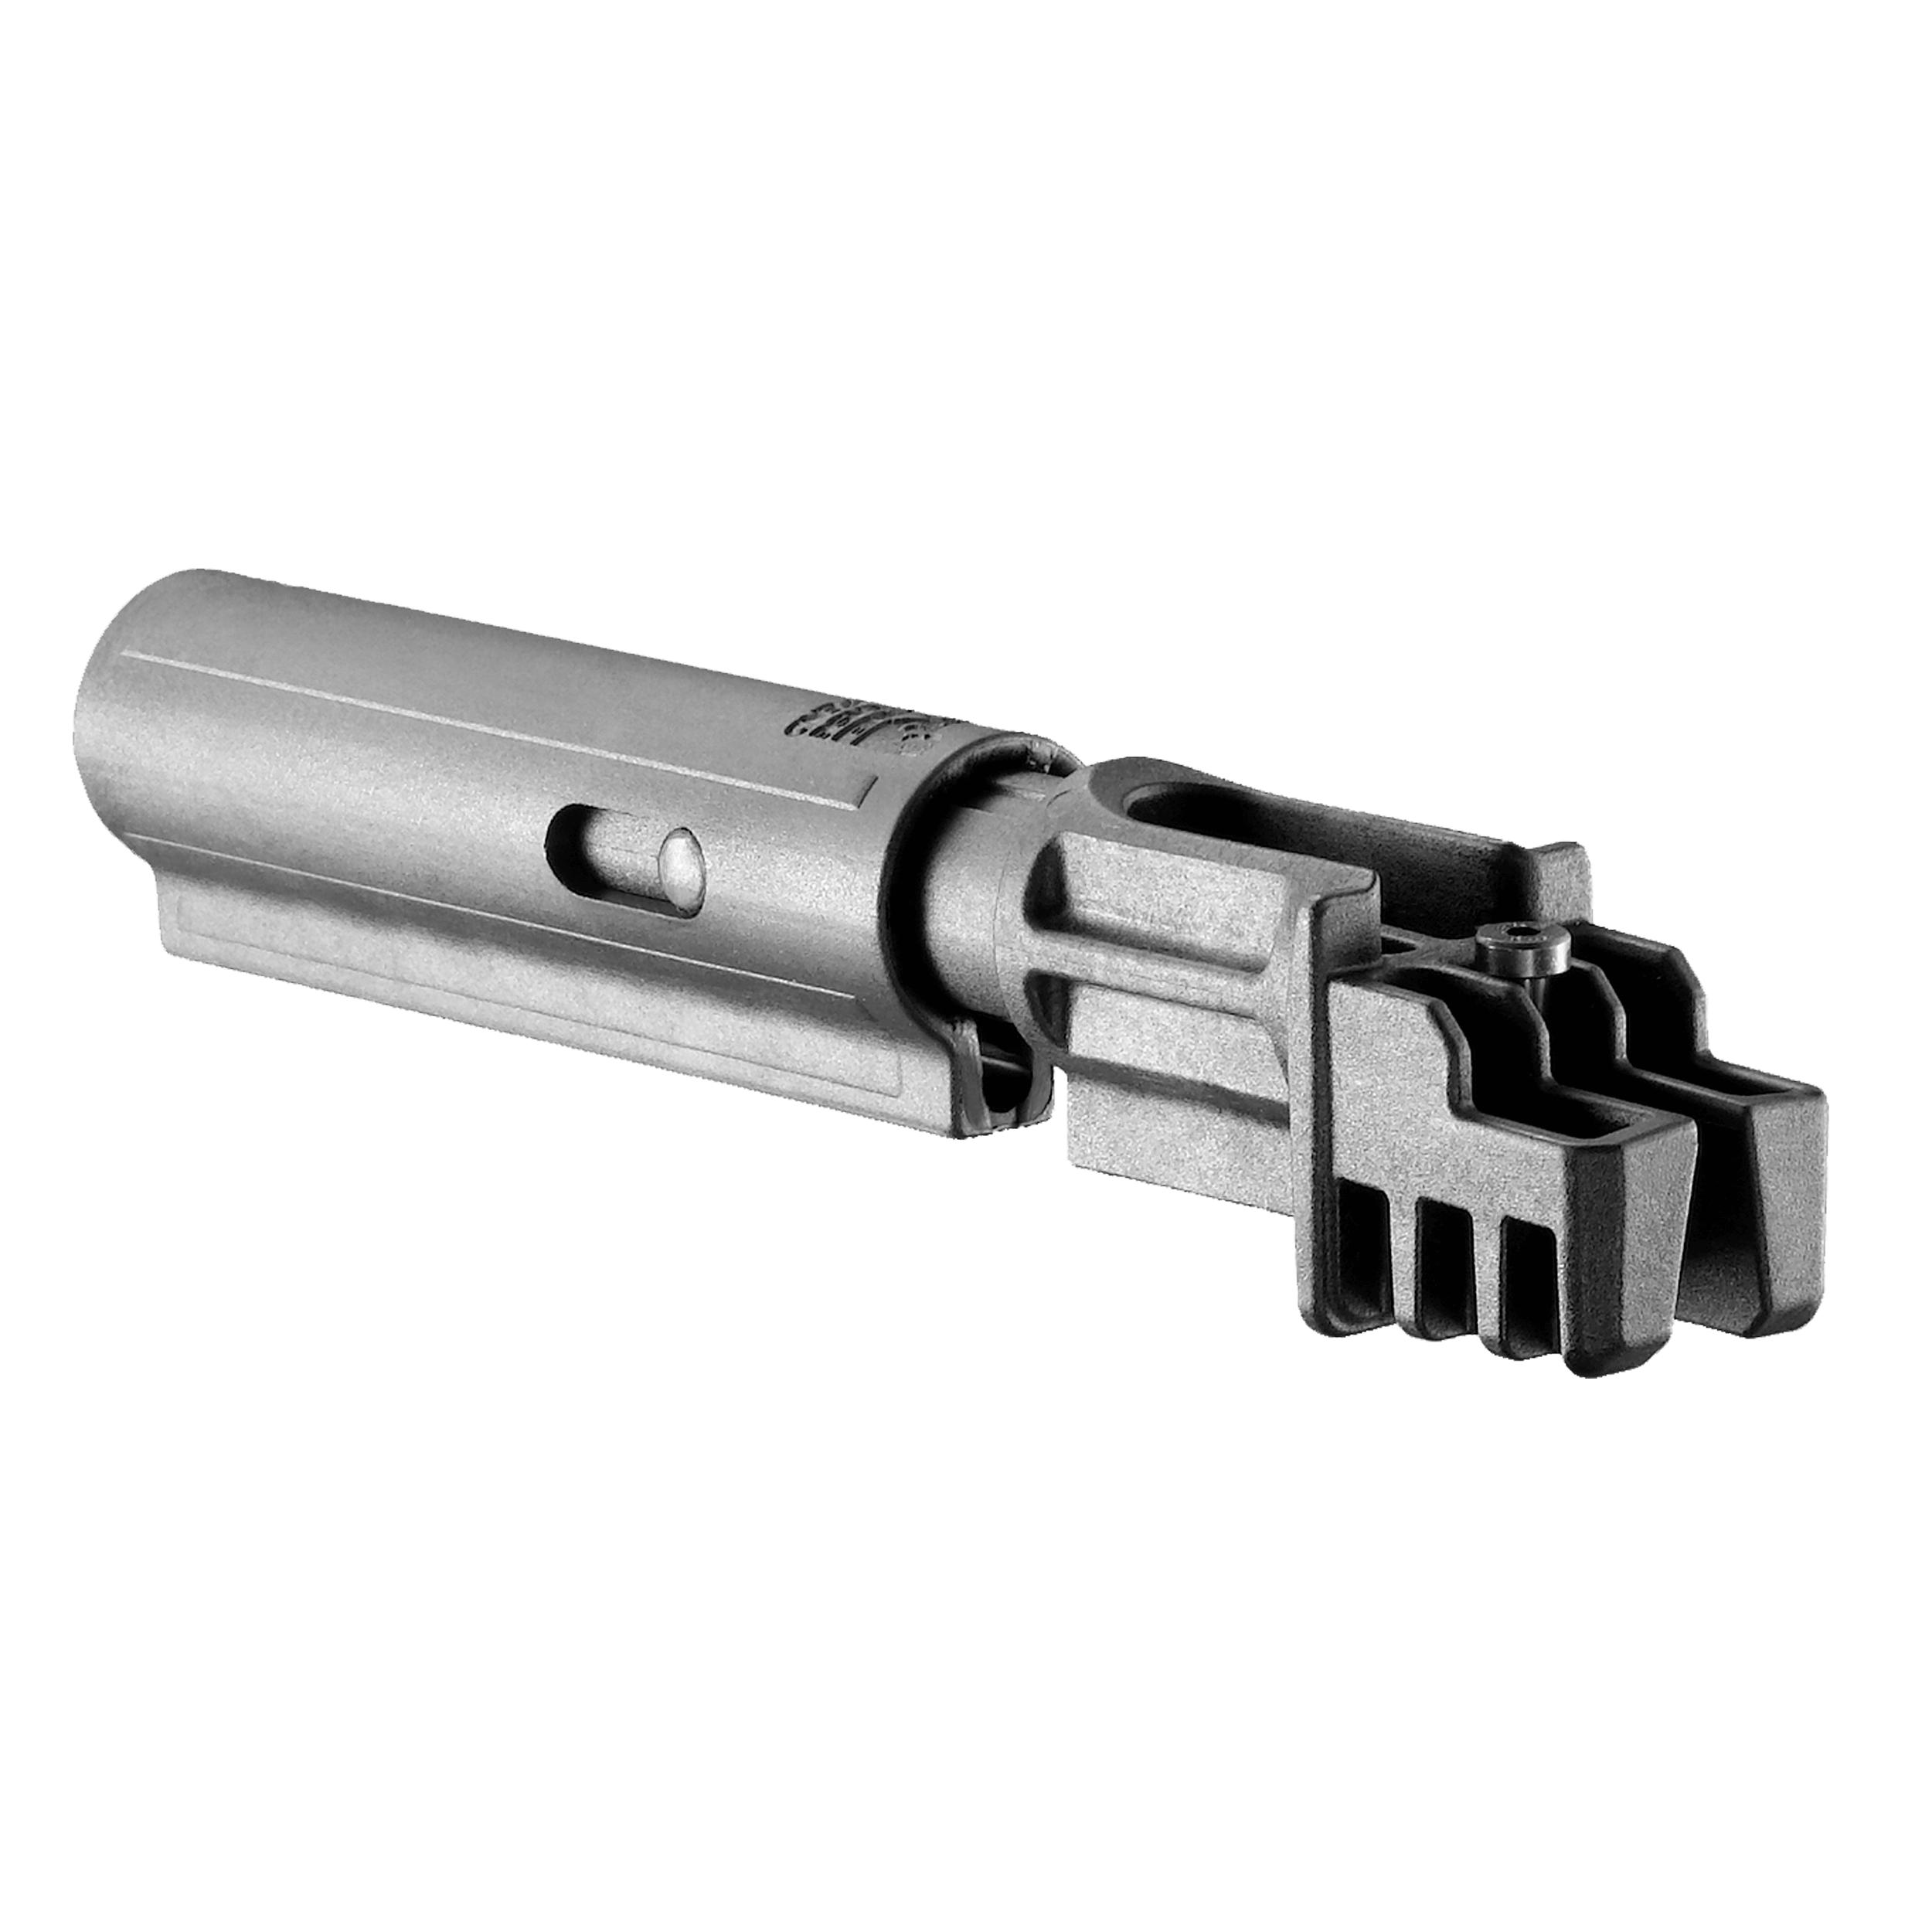 AK47 Buffer Tube / recoil reducing